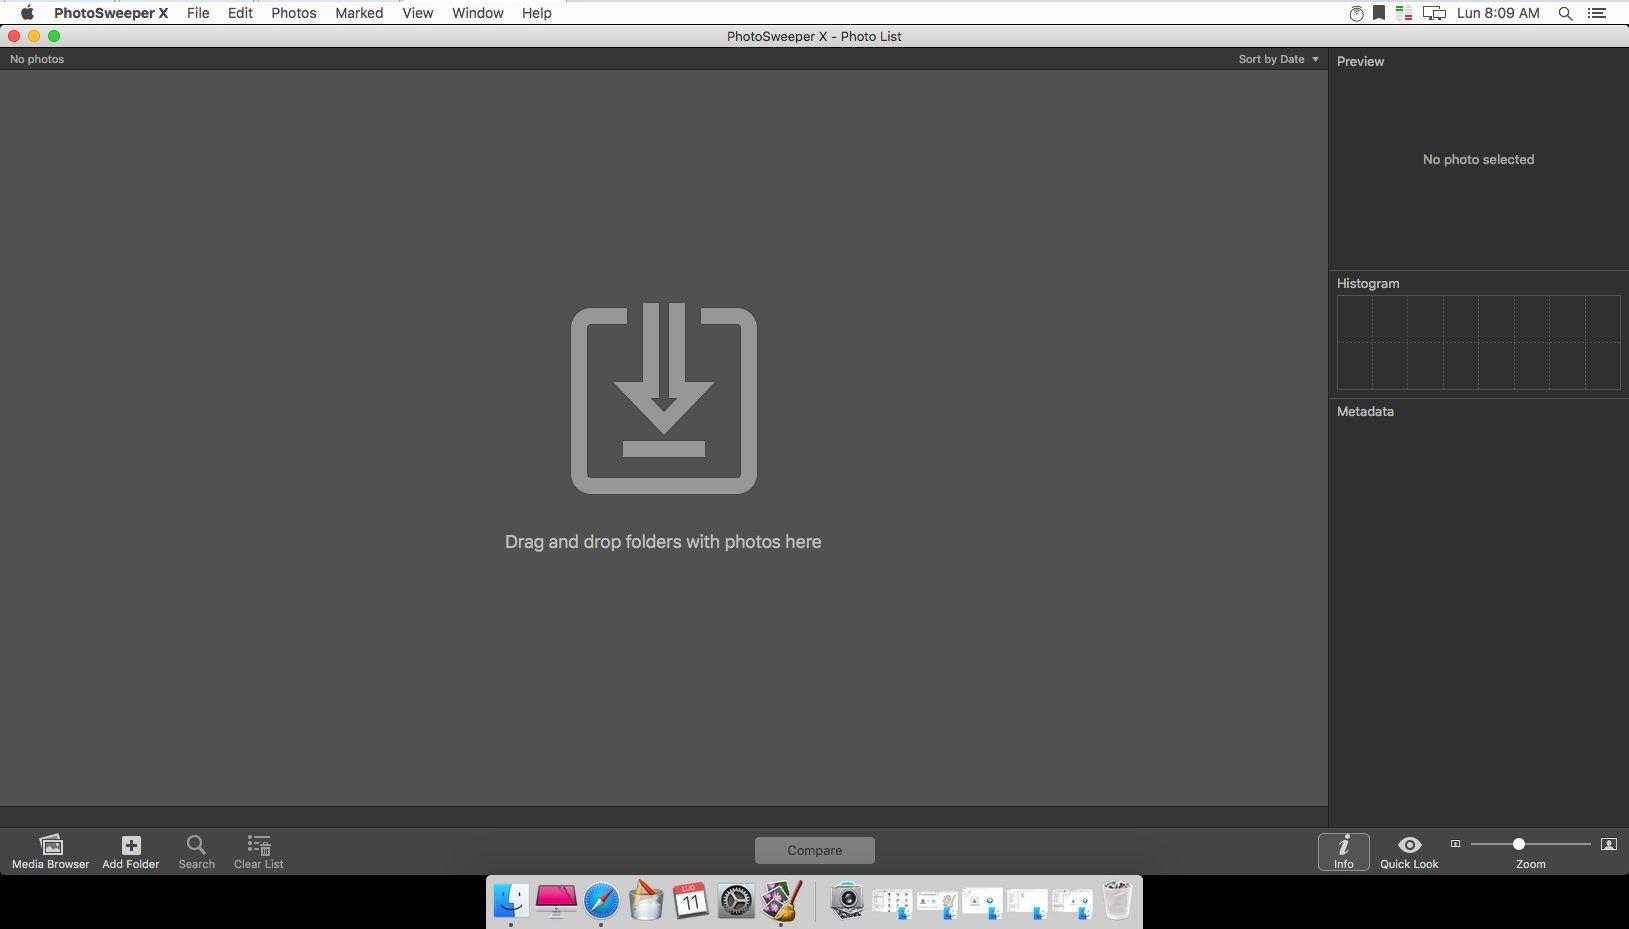 [MAC] PhotoSweeper X 3.6.2 macOS - ENG